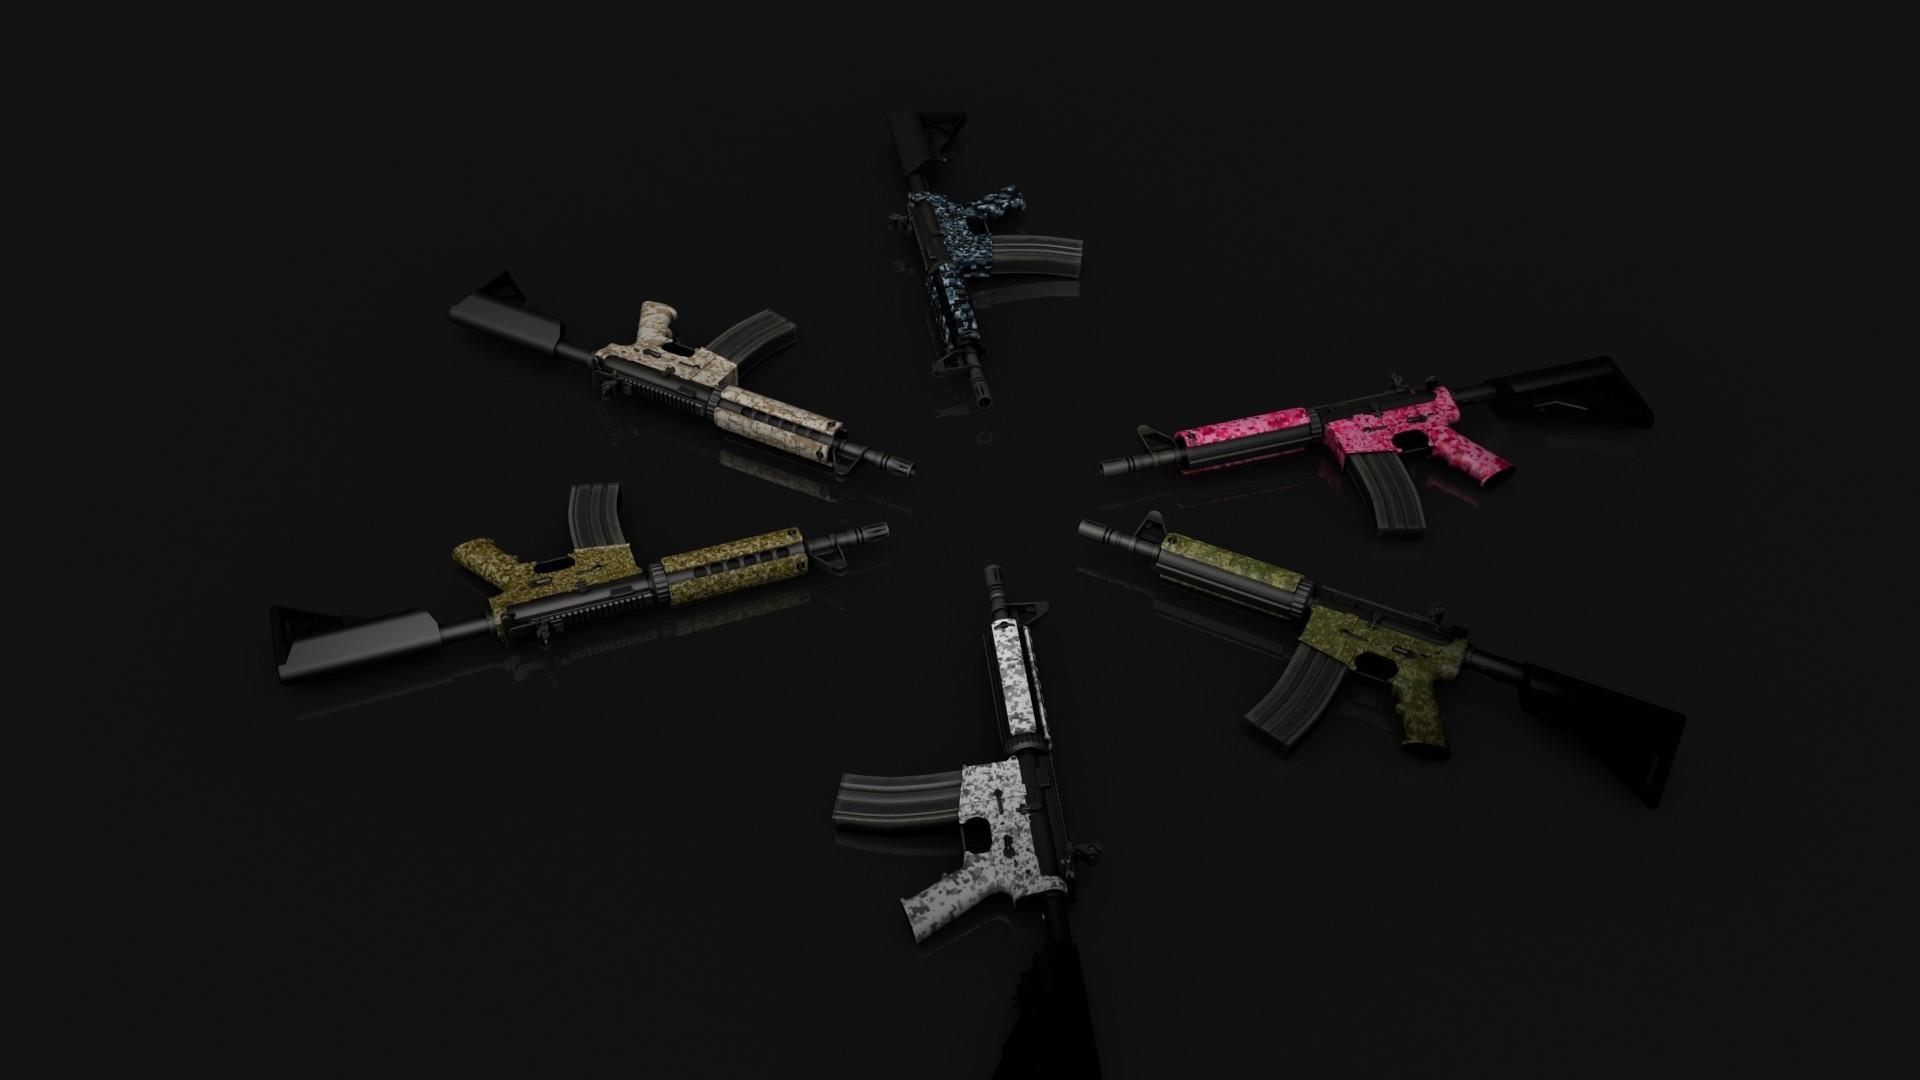 Counter-Strike-Global-Offensive-Addon-Digital-Camo-Pack-